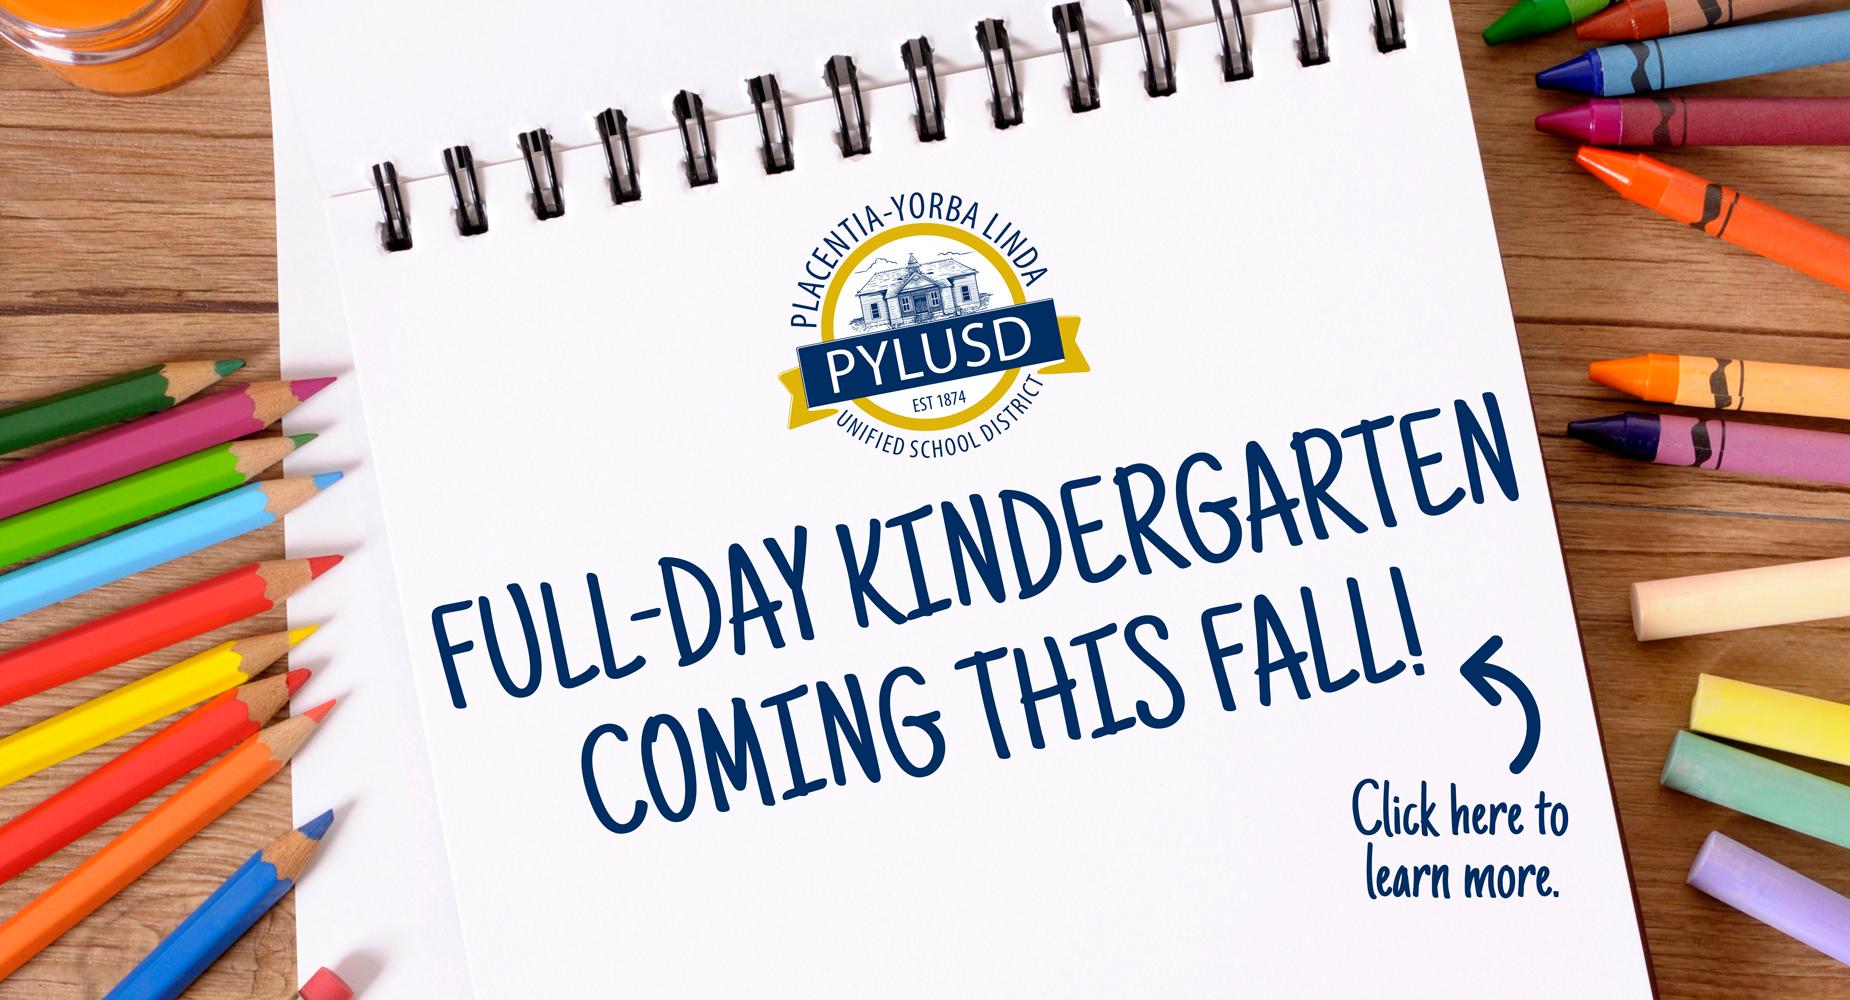 PYLUSD full-day kindergarten graphic.